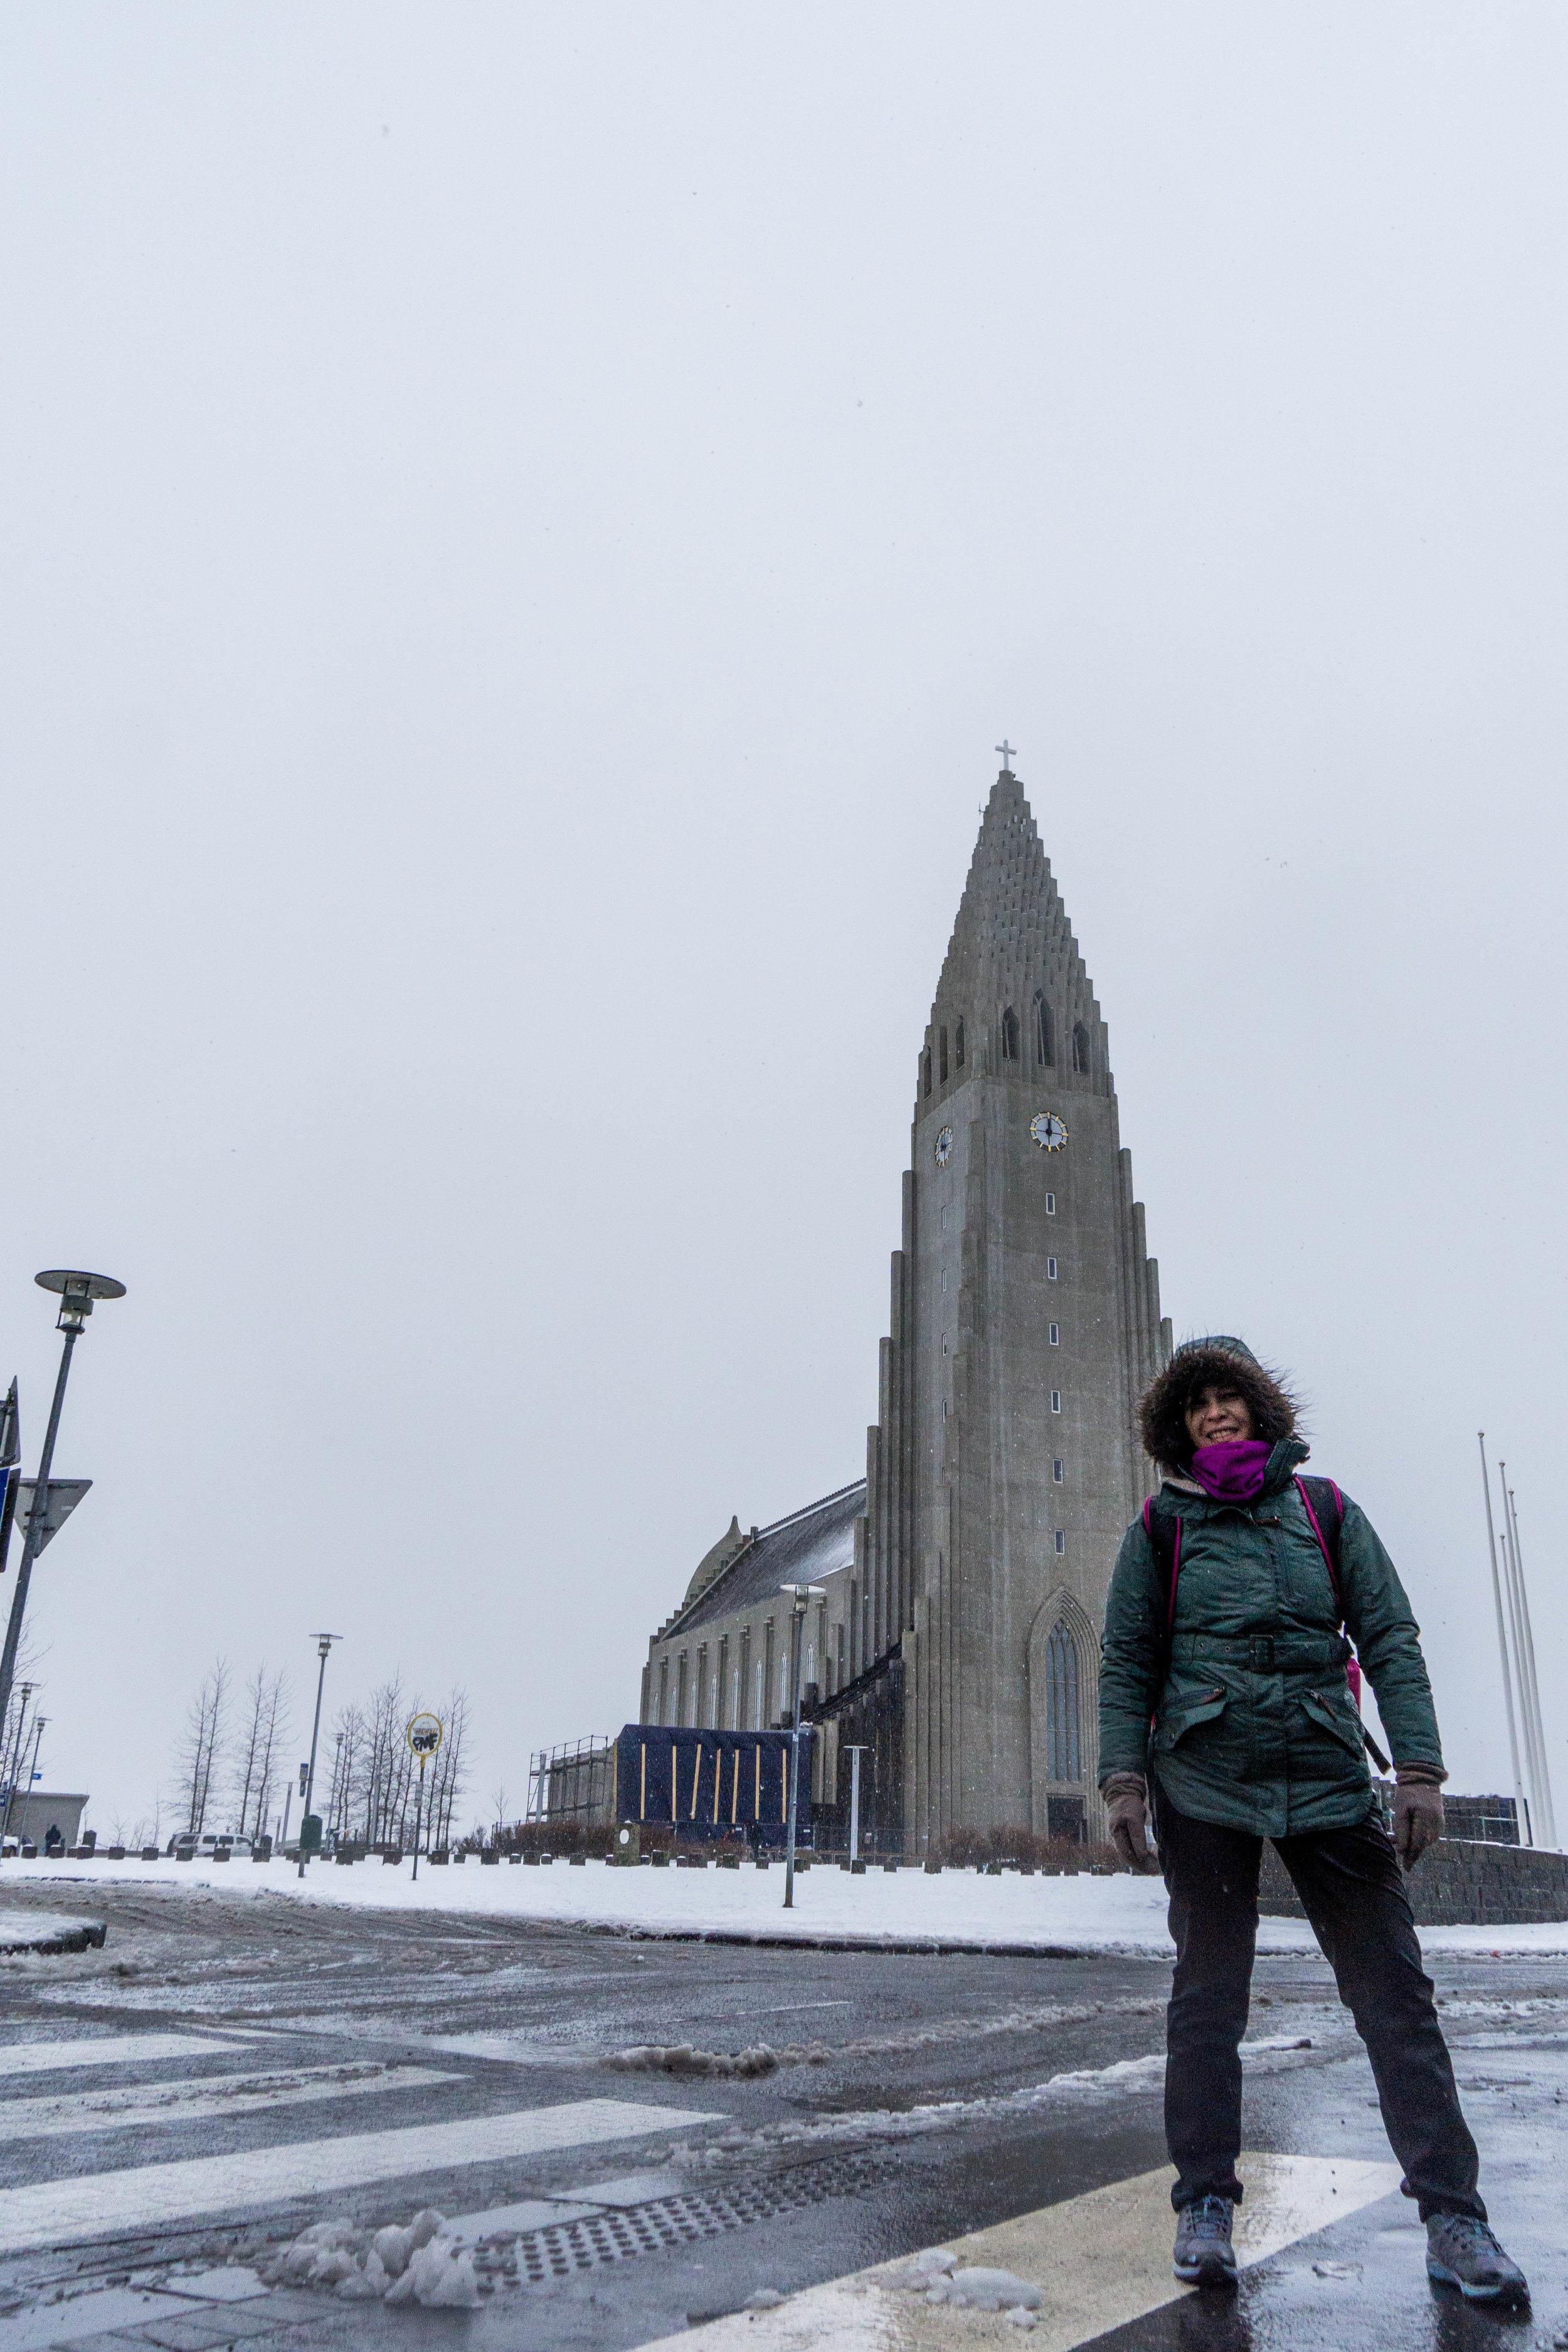 Braving the storm to visit Hallgrímskirkja.